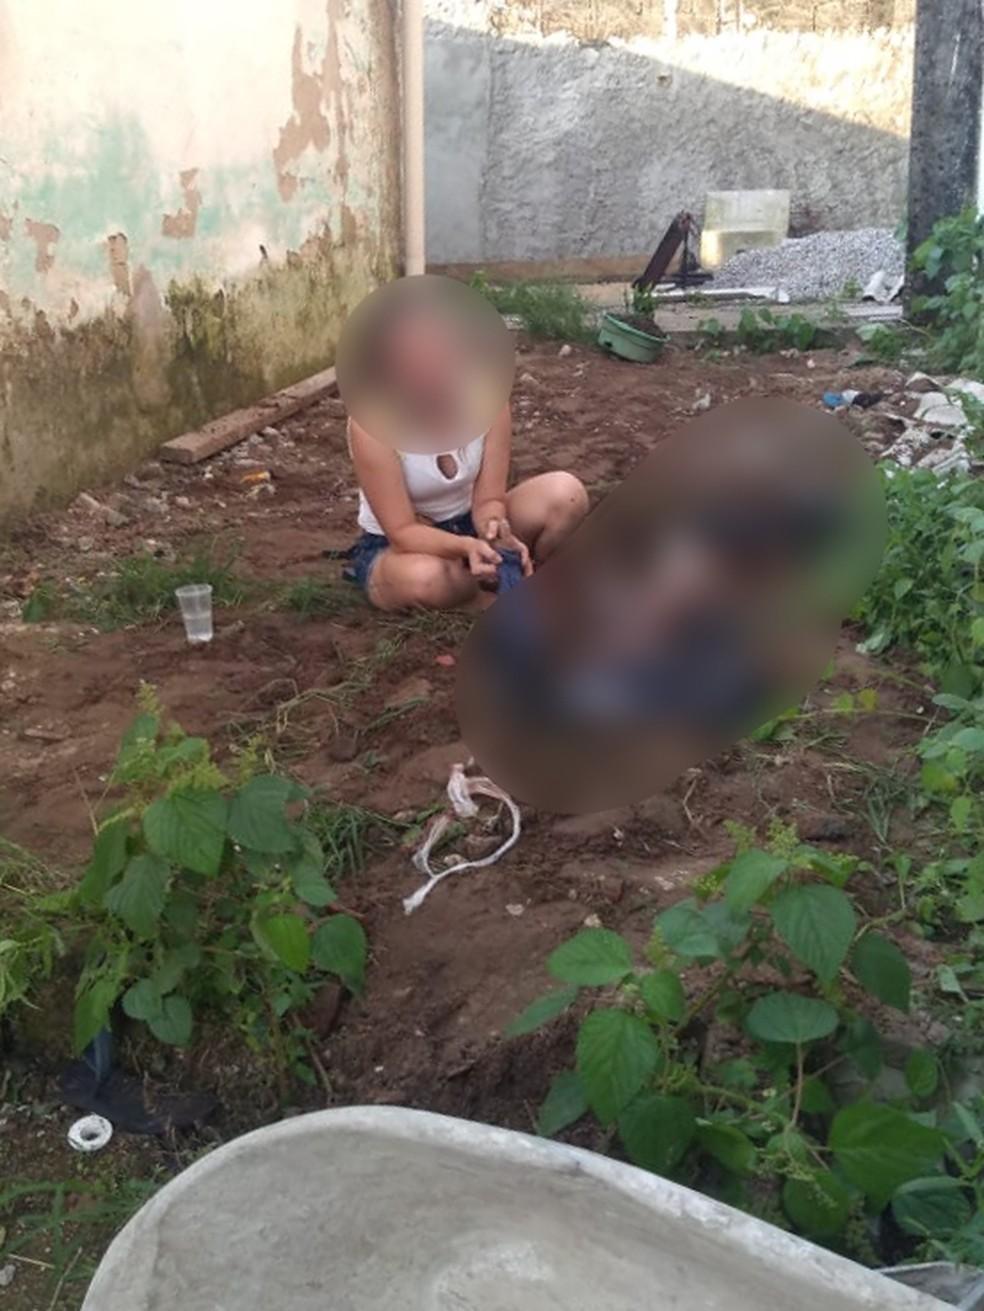 Corpo foi encontrado parcialmente enterrado na casa do suspeito — Foto: G1 Santos